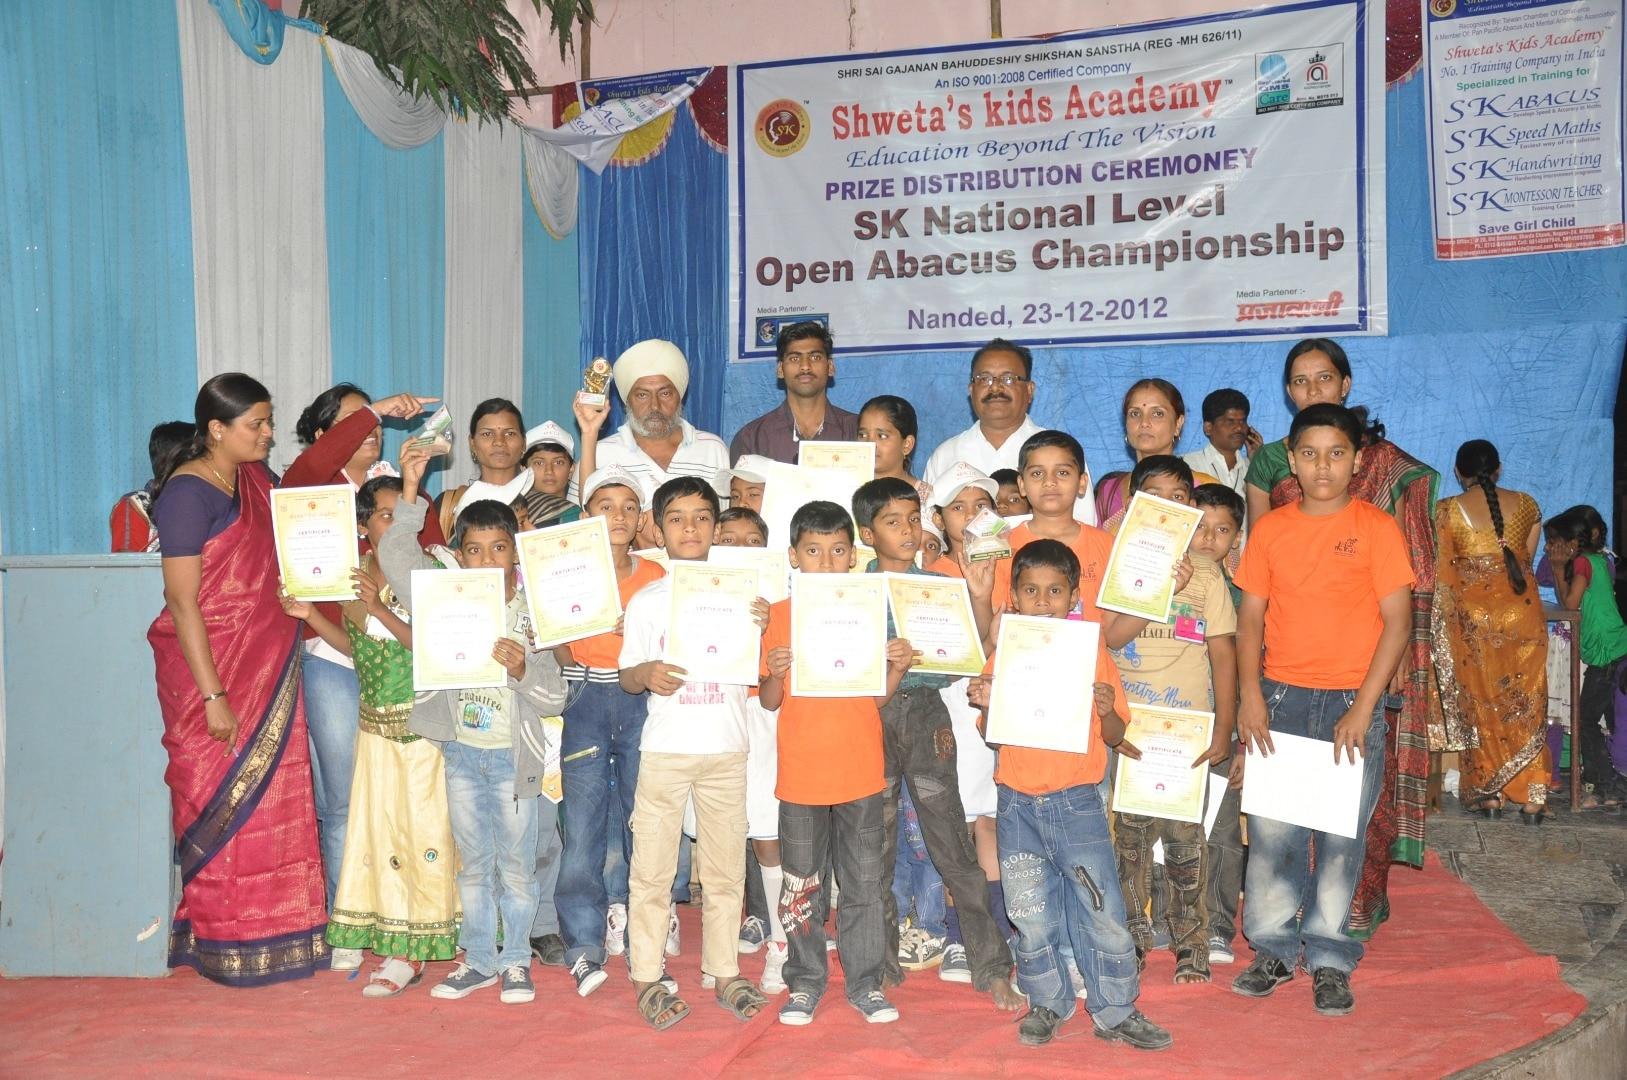 Shweta's Kids Academ